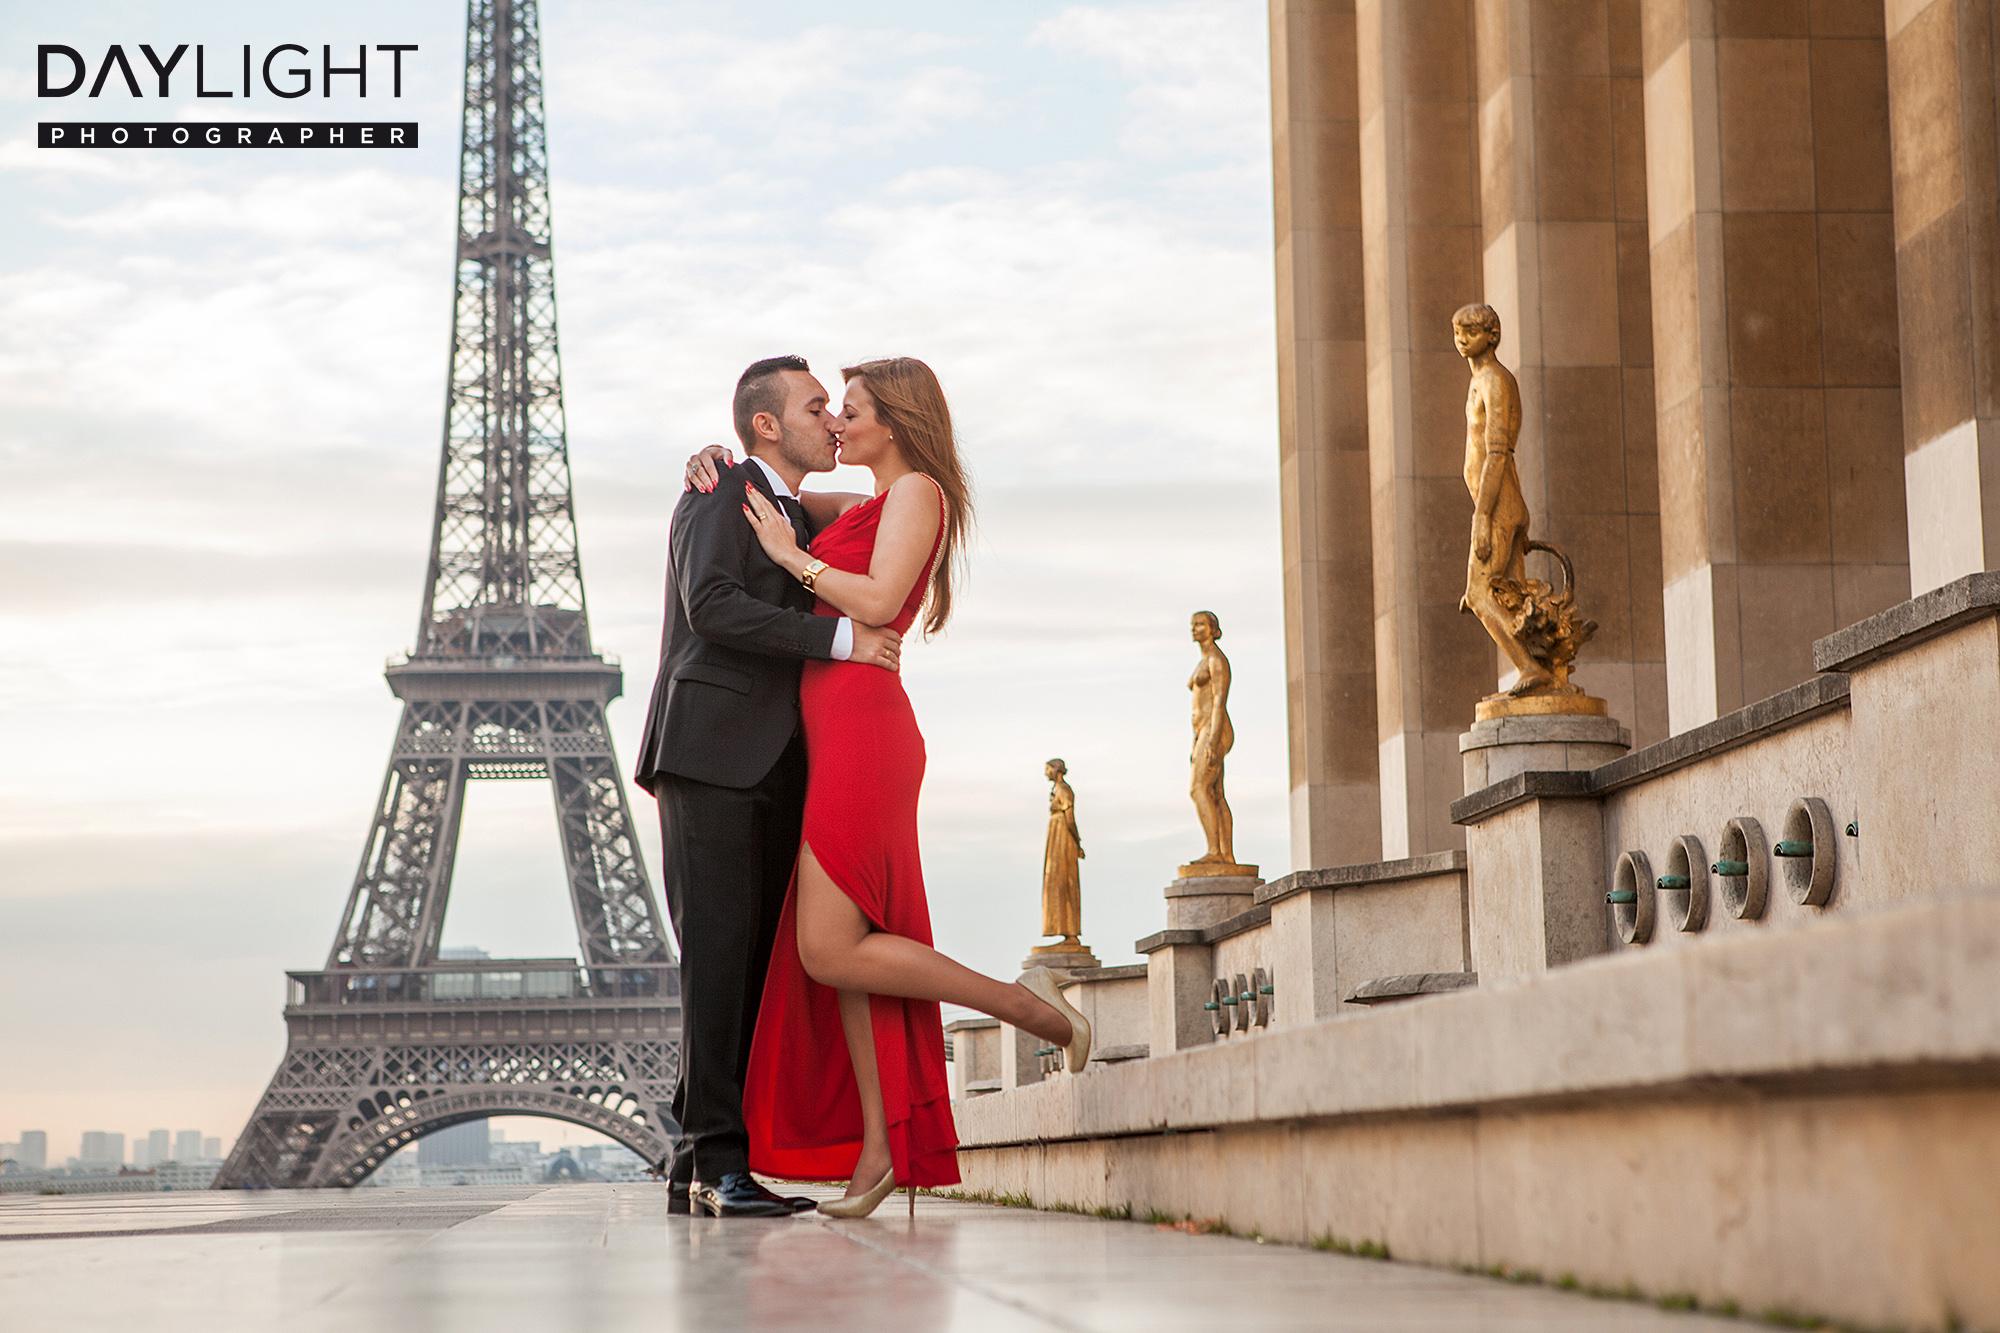 Shooting Eiffelturm